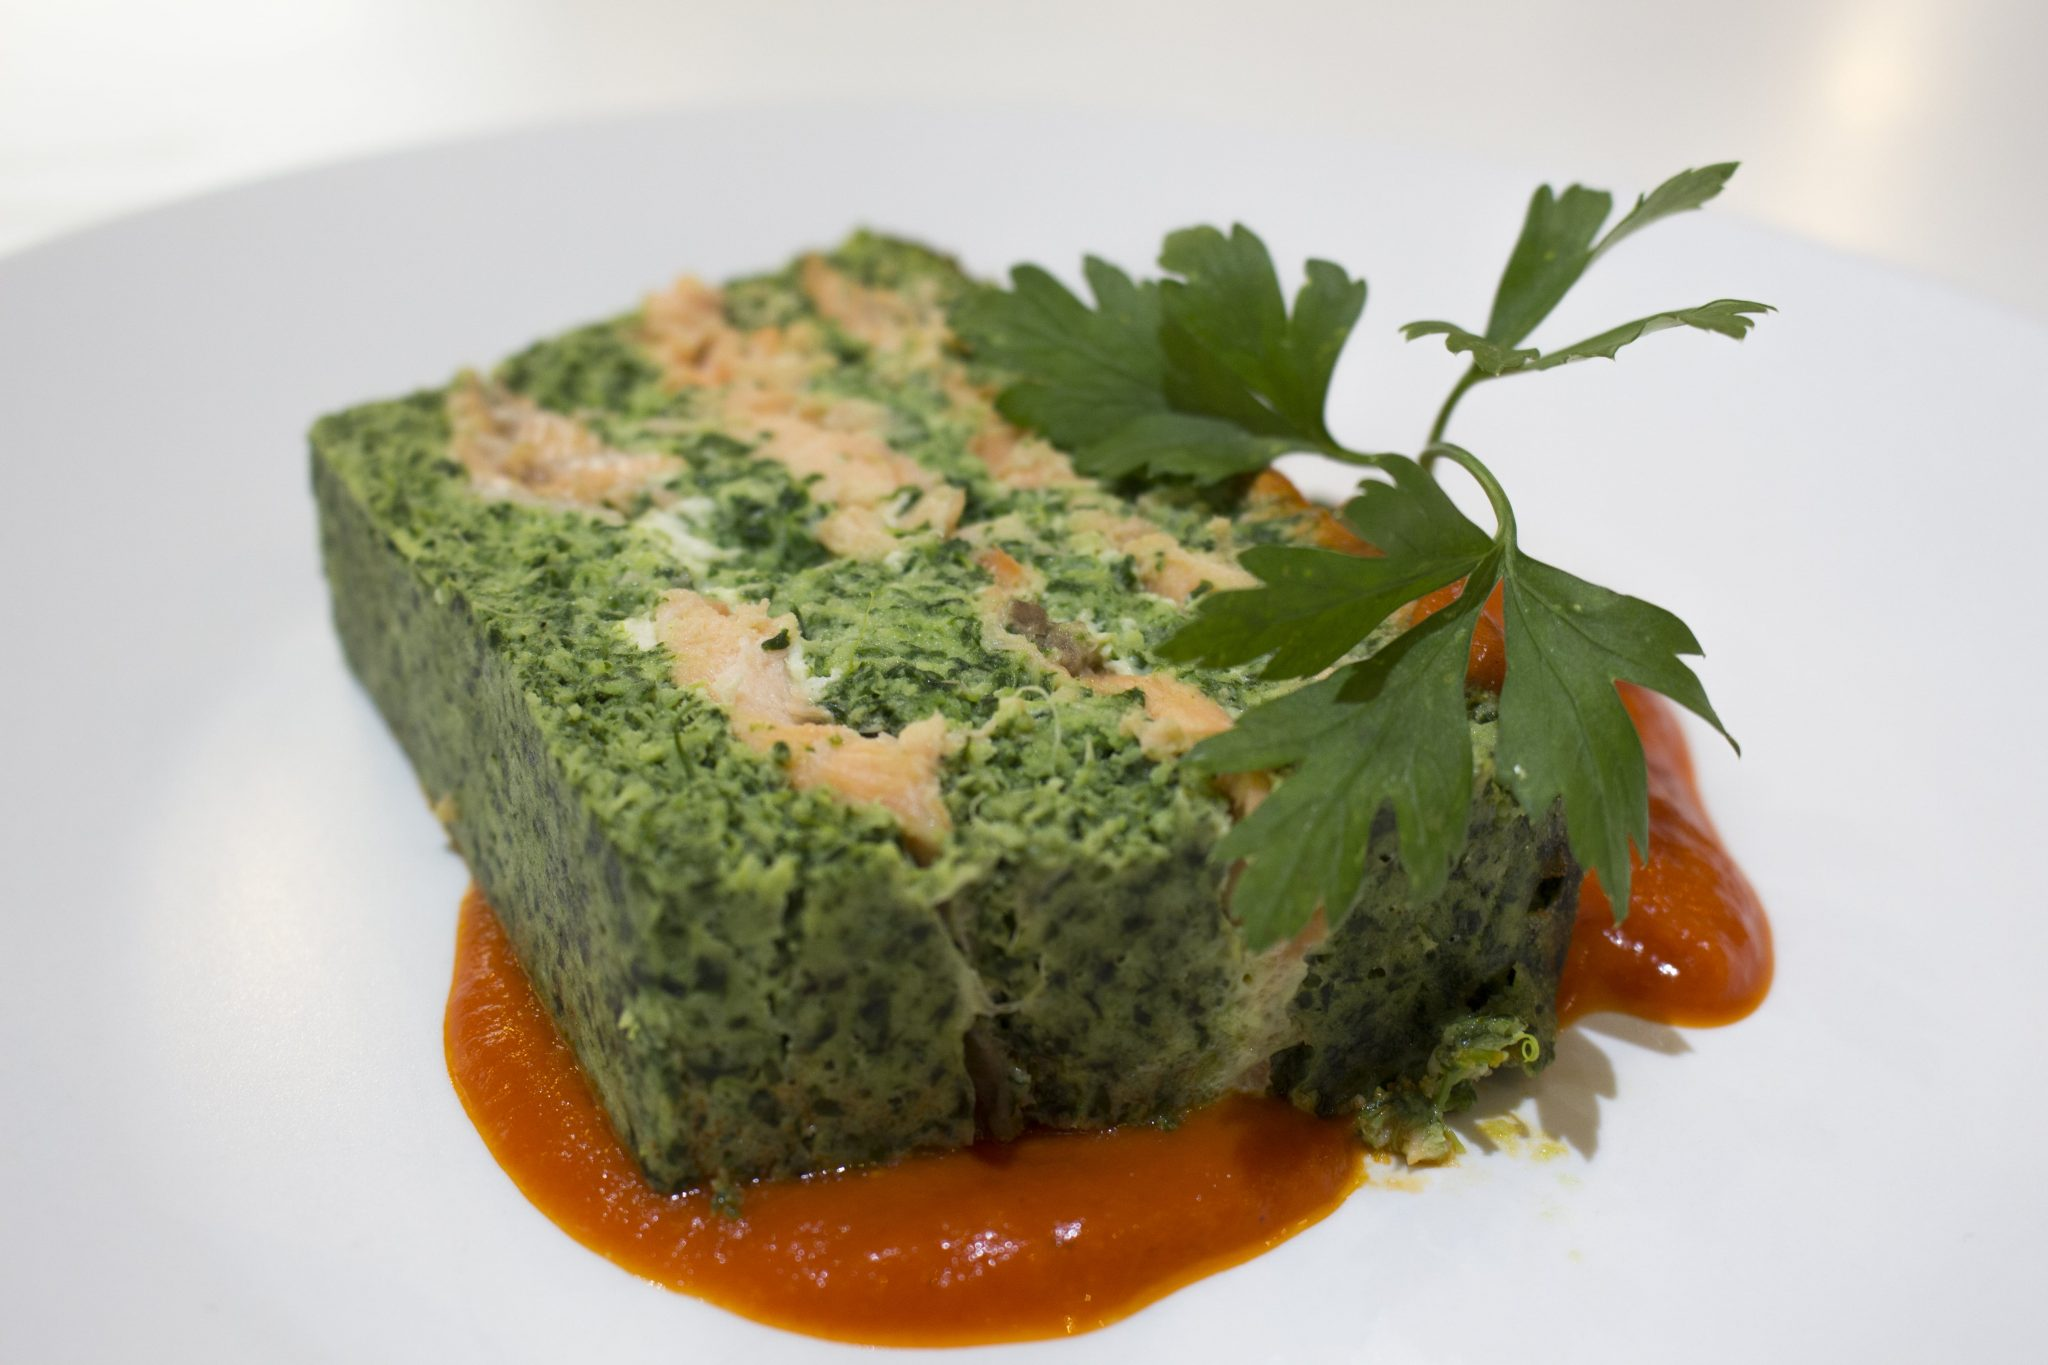 Terrina de salmón, merluza y espinacas escuela de cocina telva